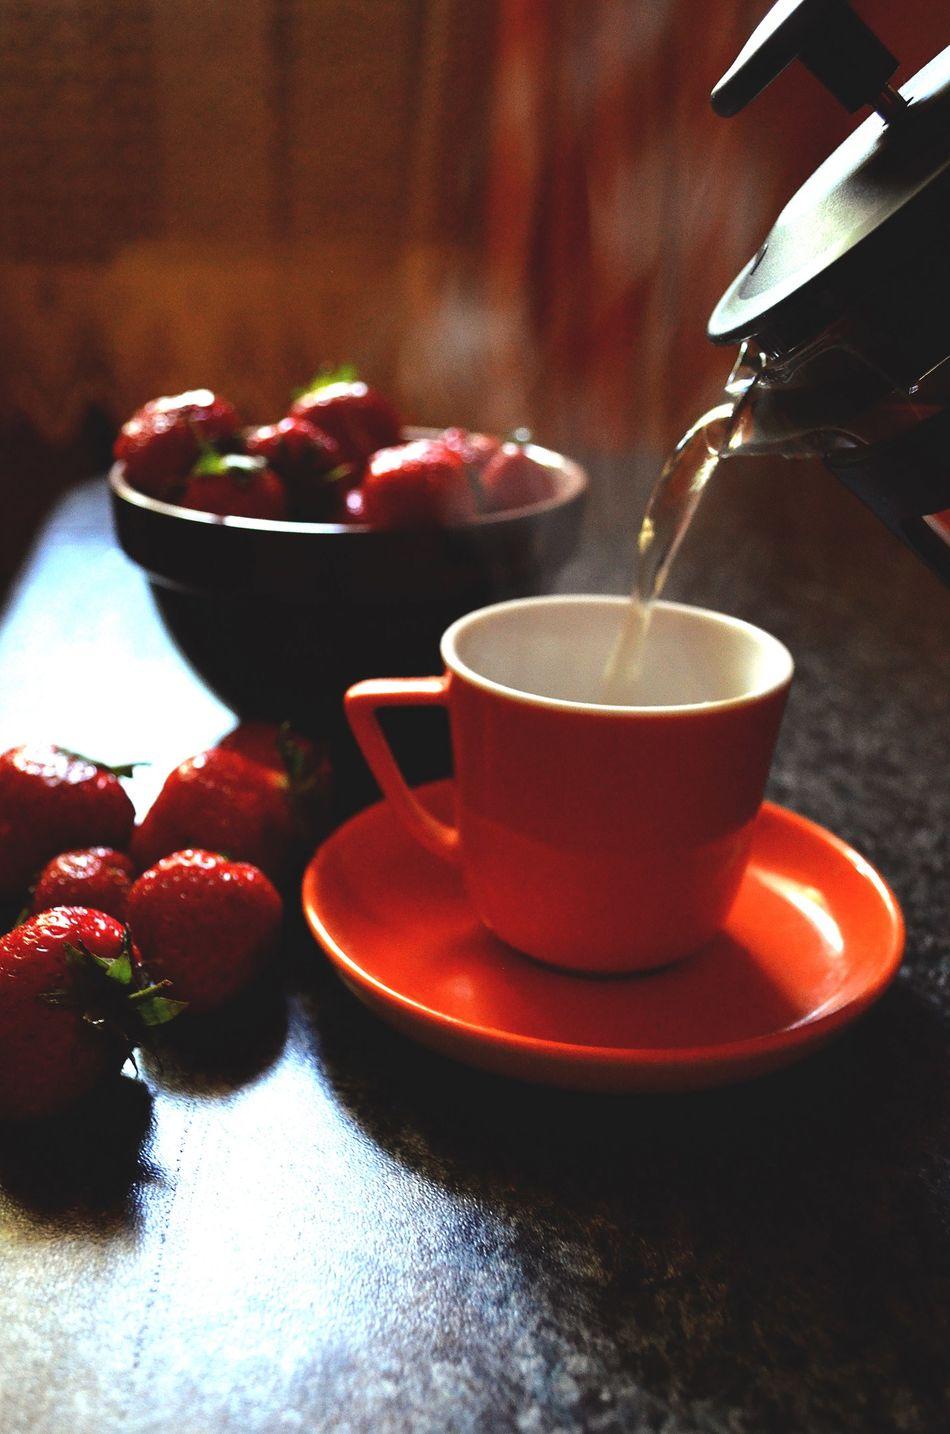 Morning Food ElenaZ Summer Photography Fruit Strawberry Photo Read Tea Love Sweet Food Day Hot